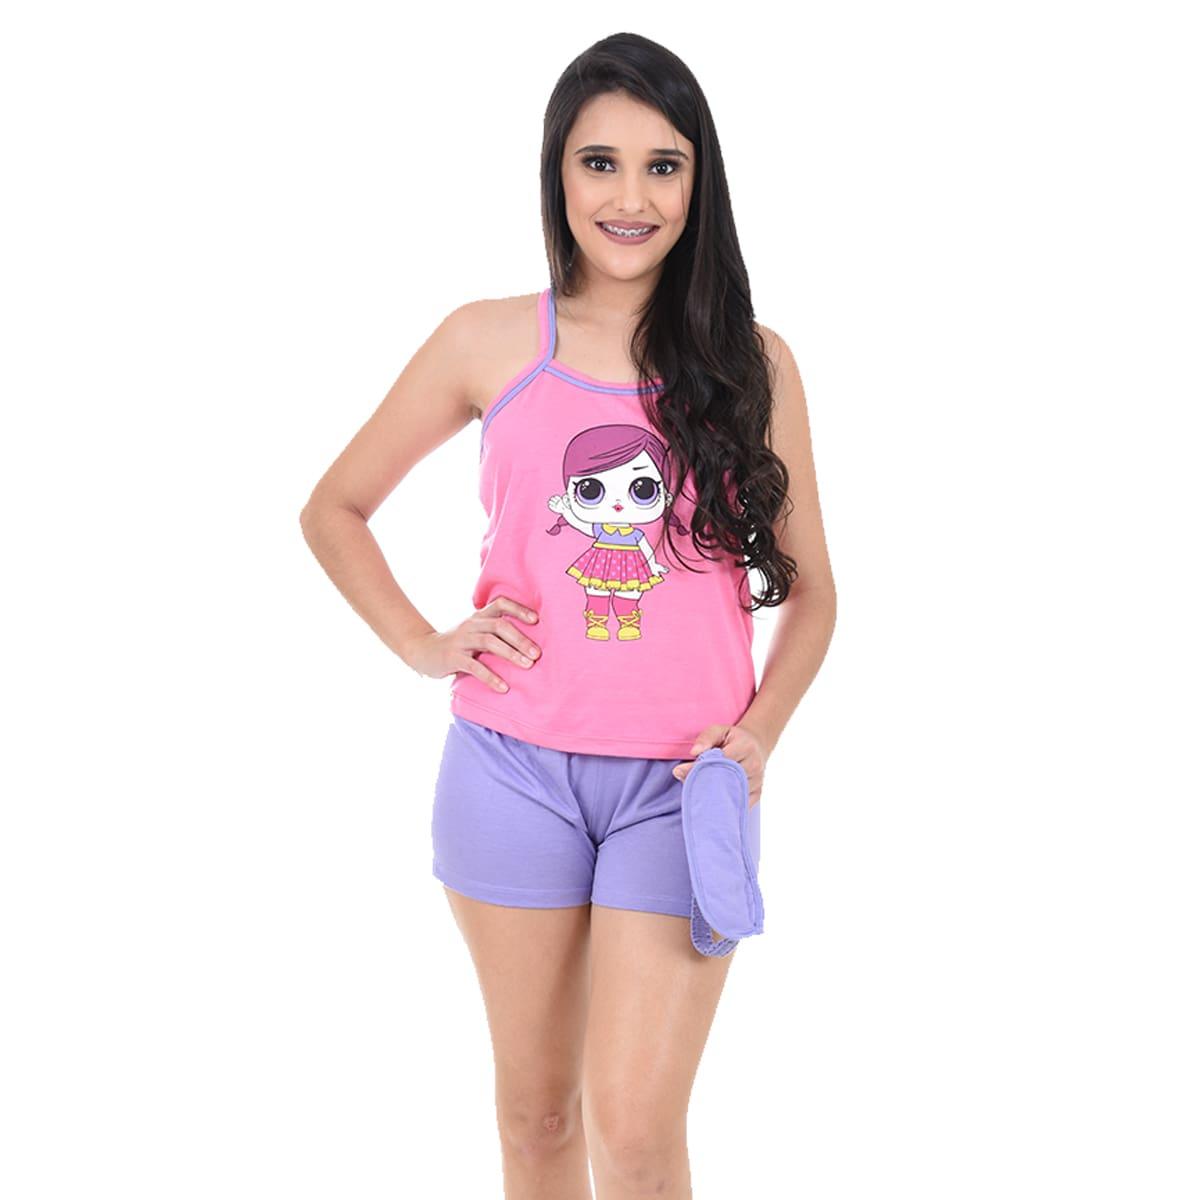 Baby Doll Short Doll Alça Adulto Feminino Com Tapa Olho LOL Surprise Ref: 330